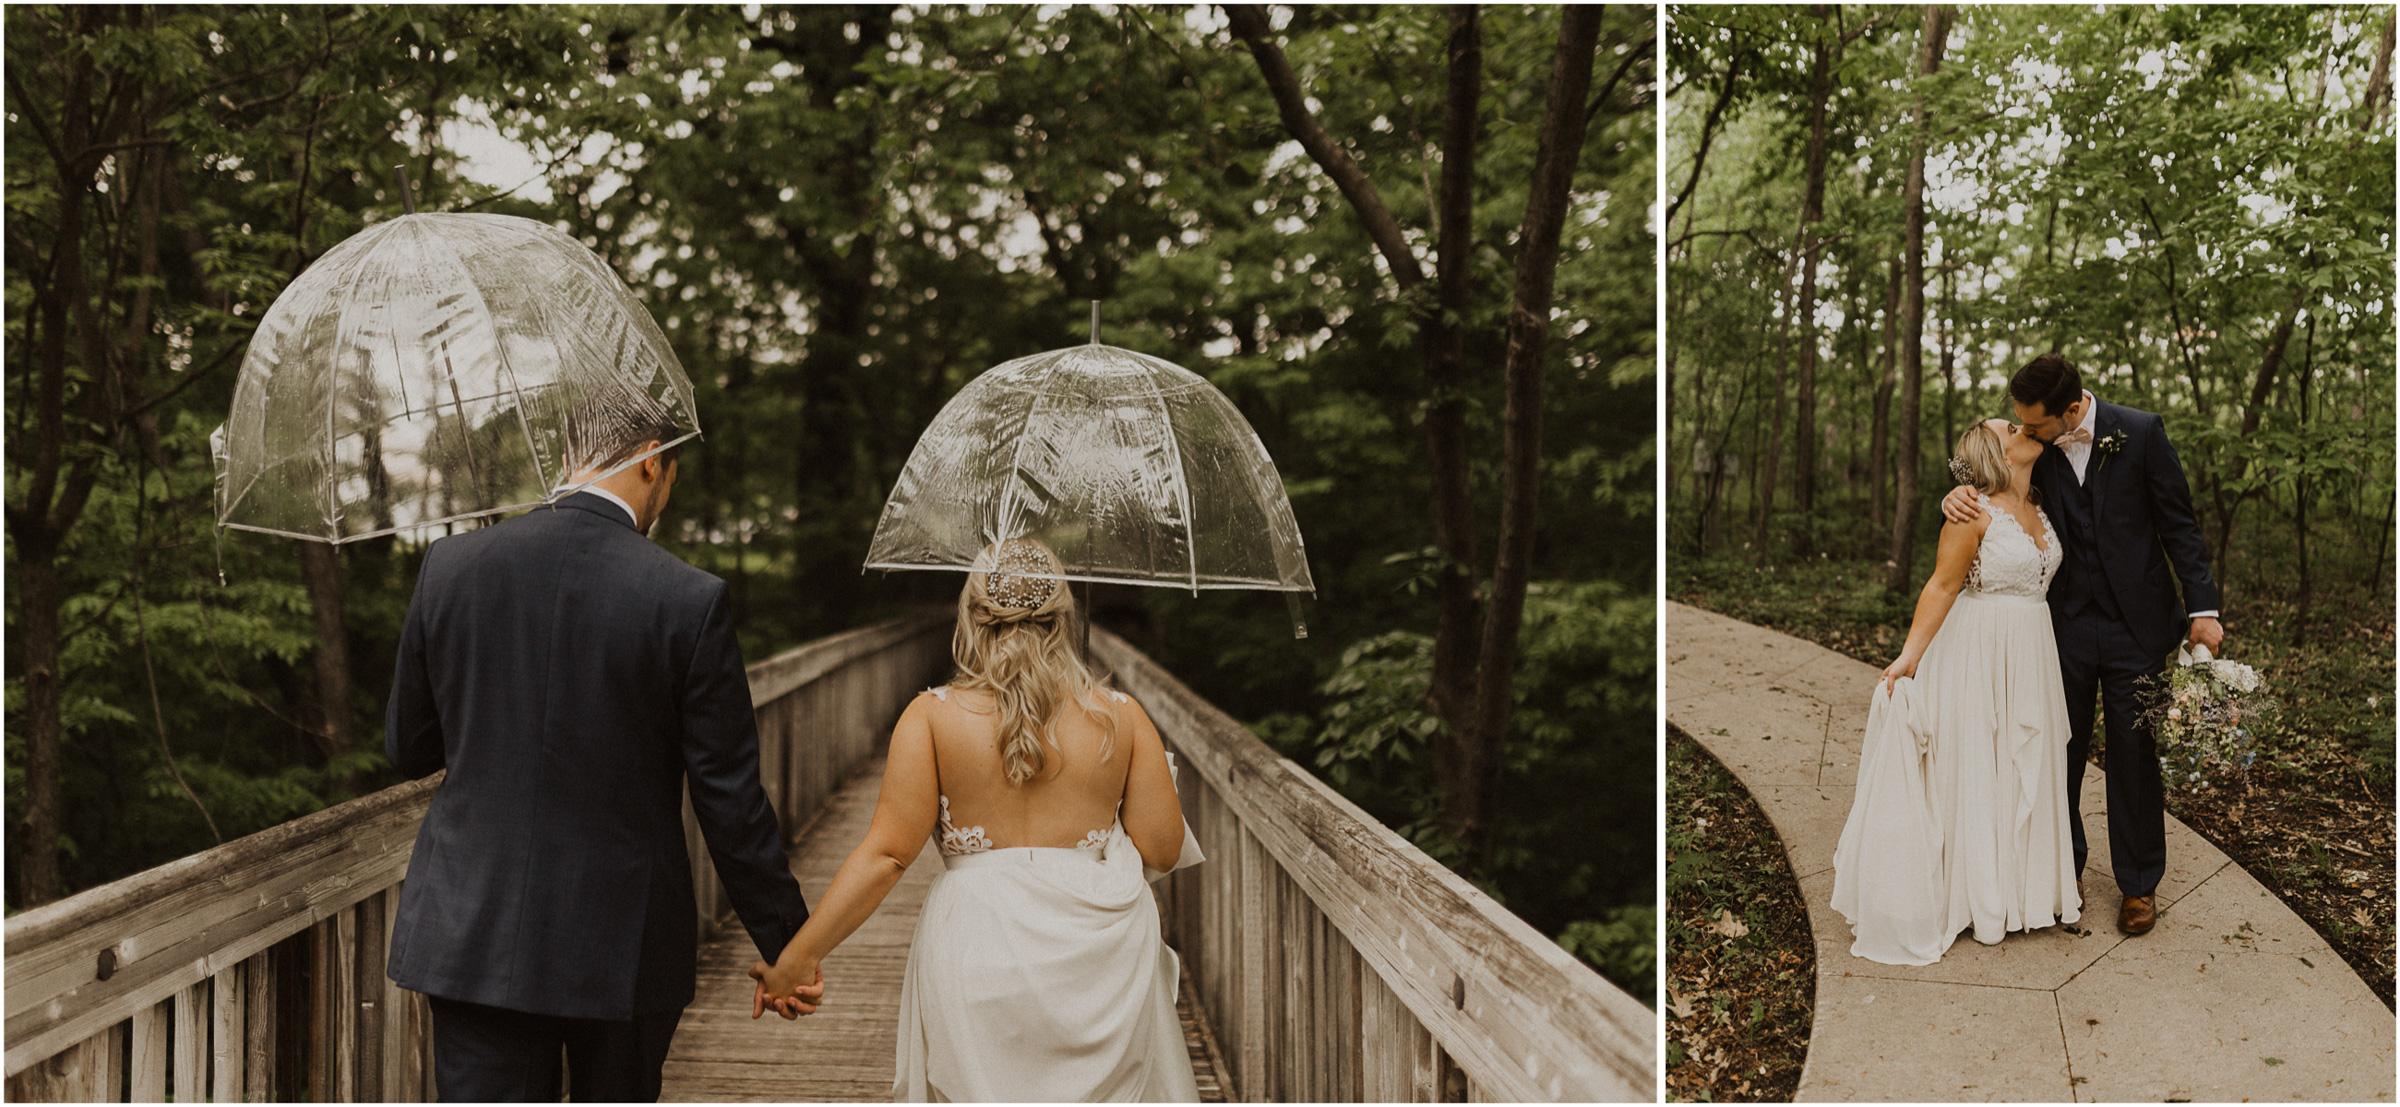 alyssa barletter photography nelson wedding nebraska city lied lodge morton barn spring wedding photographer-17.jpg